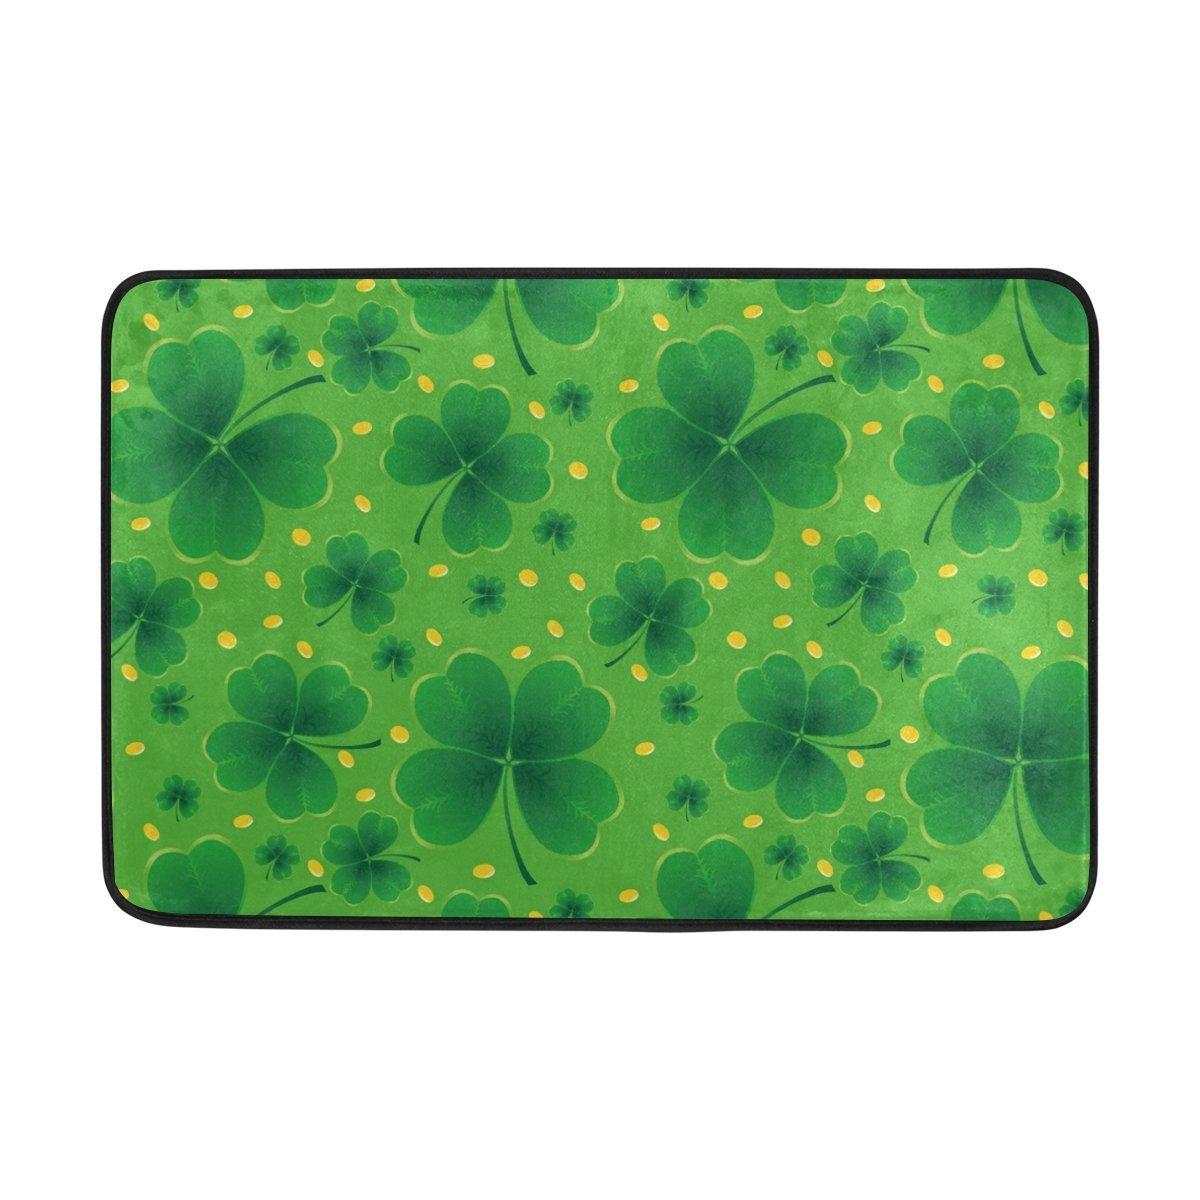 Saint Patricks Day Shower Curtain and Mat Set, Lucky Clover Spring Green Leaf Waterproof Fabric Bathroom Curtain